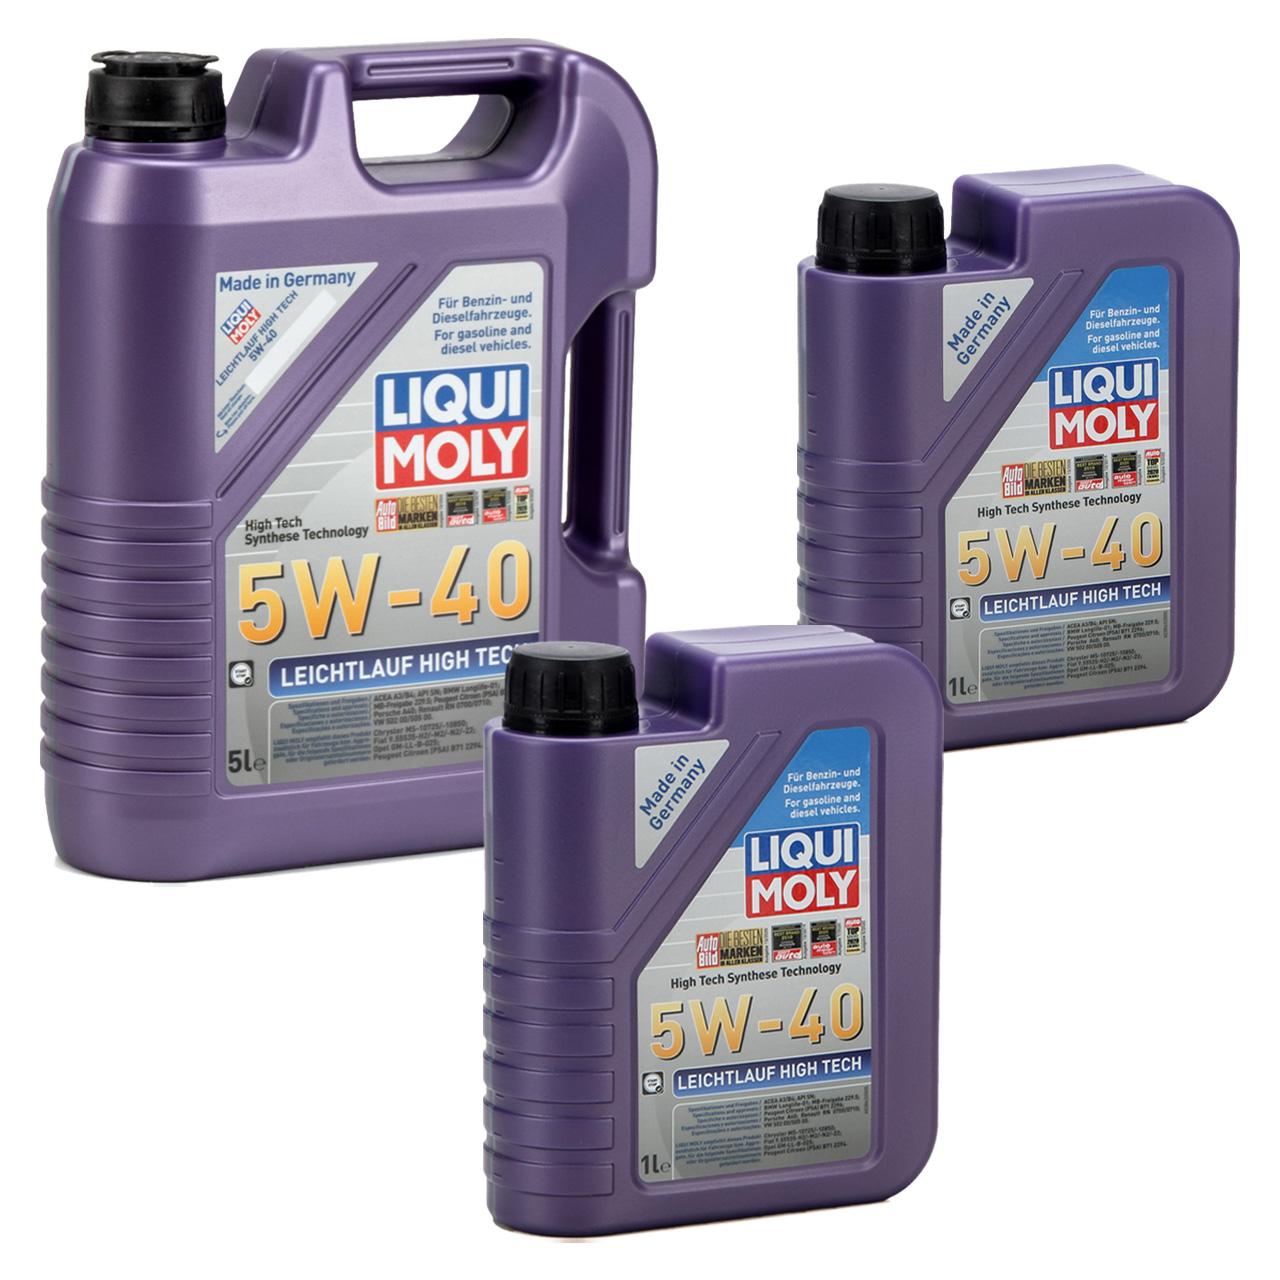 LIQUI MOLY Motoröl Öl Leichtlauf HIGH TECH 5W40 BMW LL-01 MB 229.5 - 7L 7 Liter